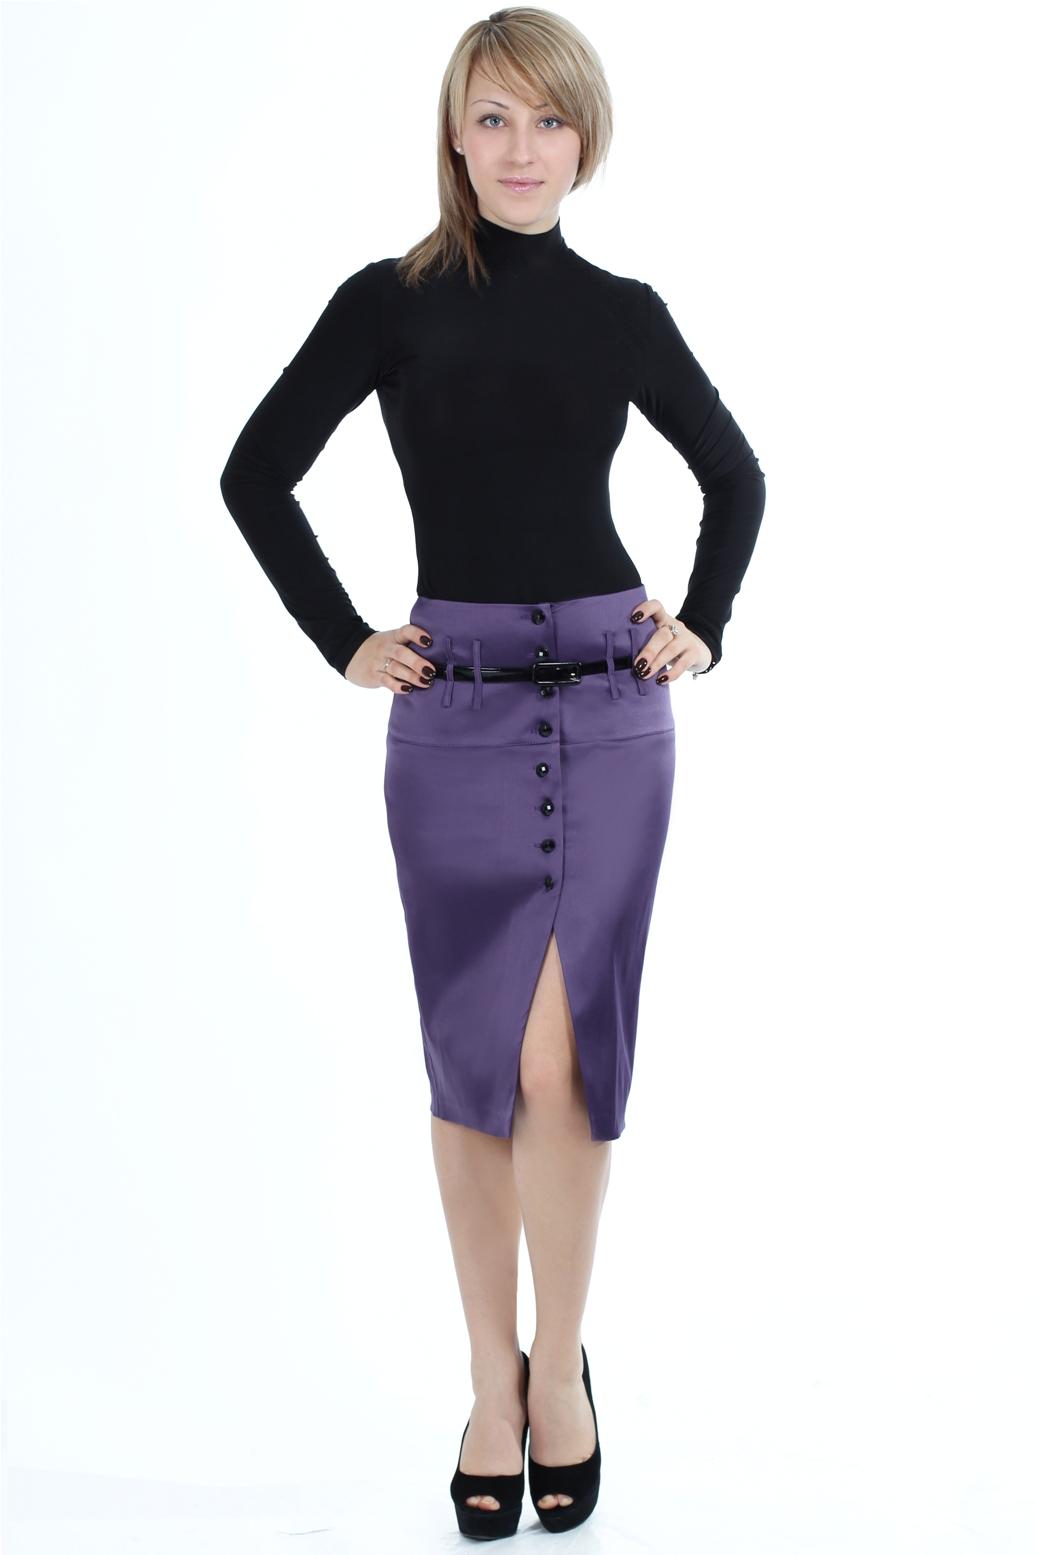 Купить юбку недорого